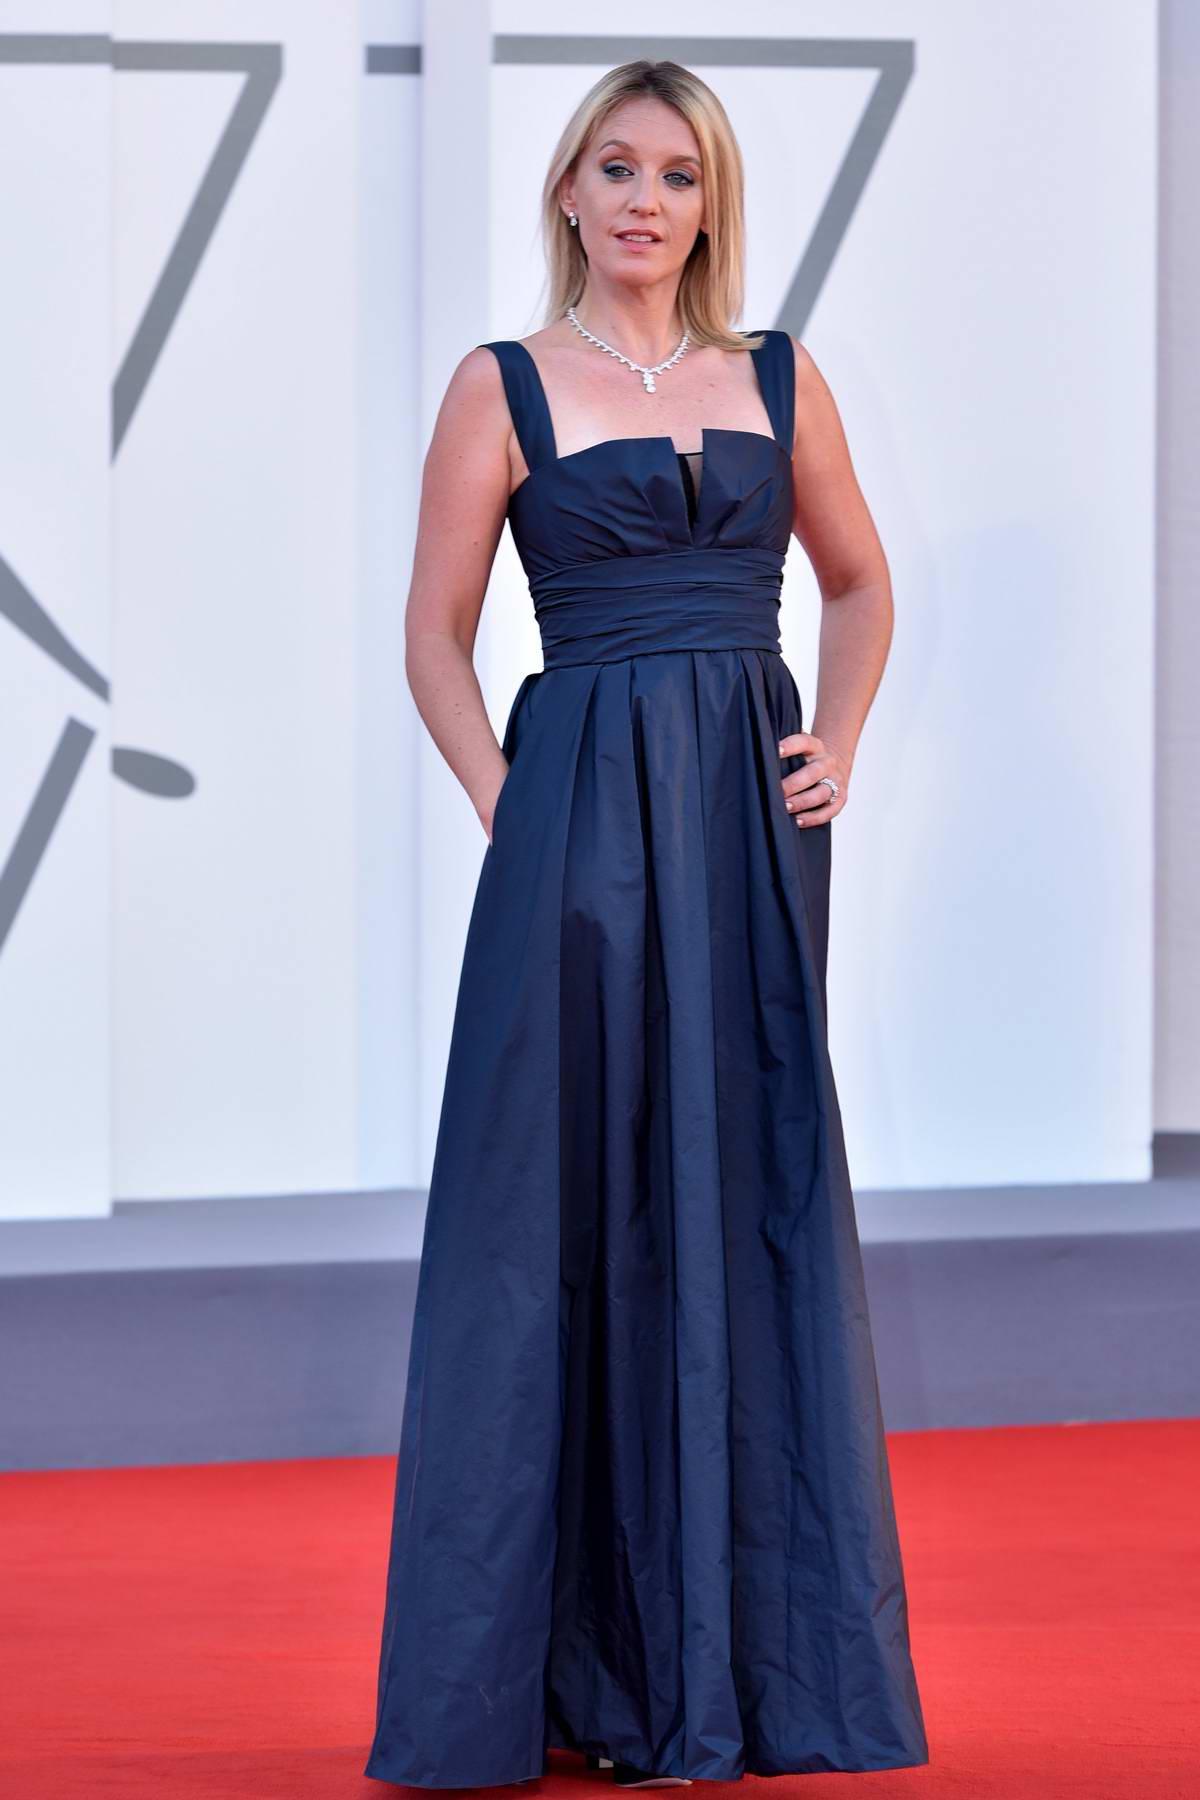 Ludivine Sagnier attends the Closing Ceremony of the 77th Venice Film Festival in Venice, Italy